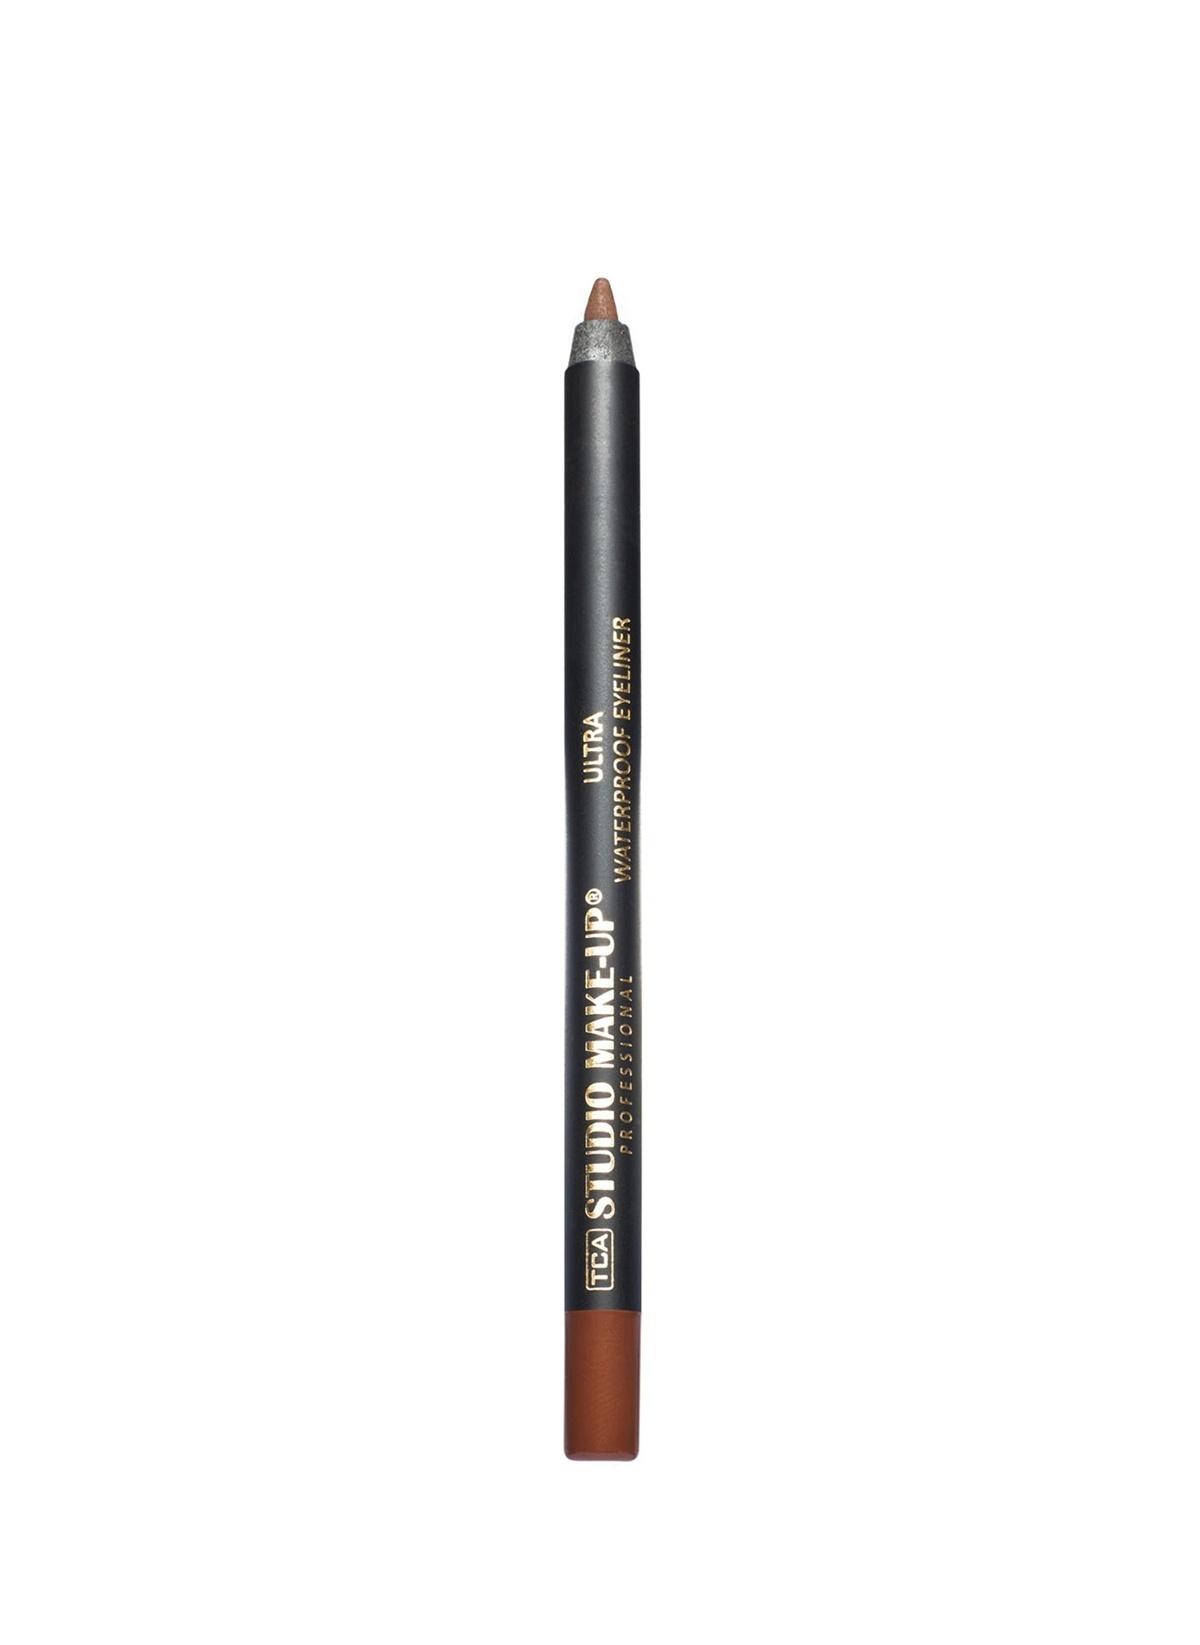 Tca Studio Make Up Ultrawaterproof Eyeliner 802 Dark Brown Tca Studıo Make-up Ultrawaterproof Eyelı – 9.99 TL